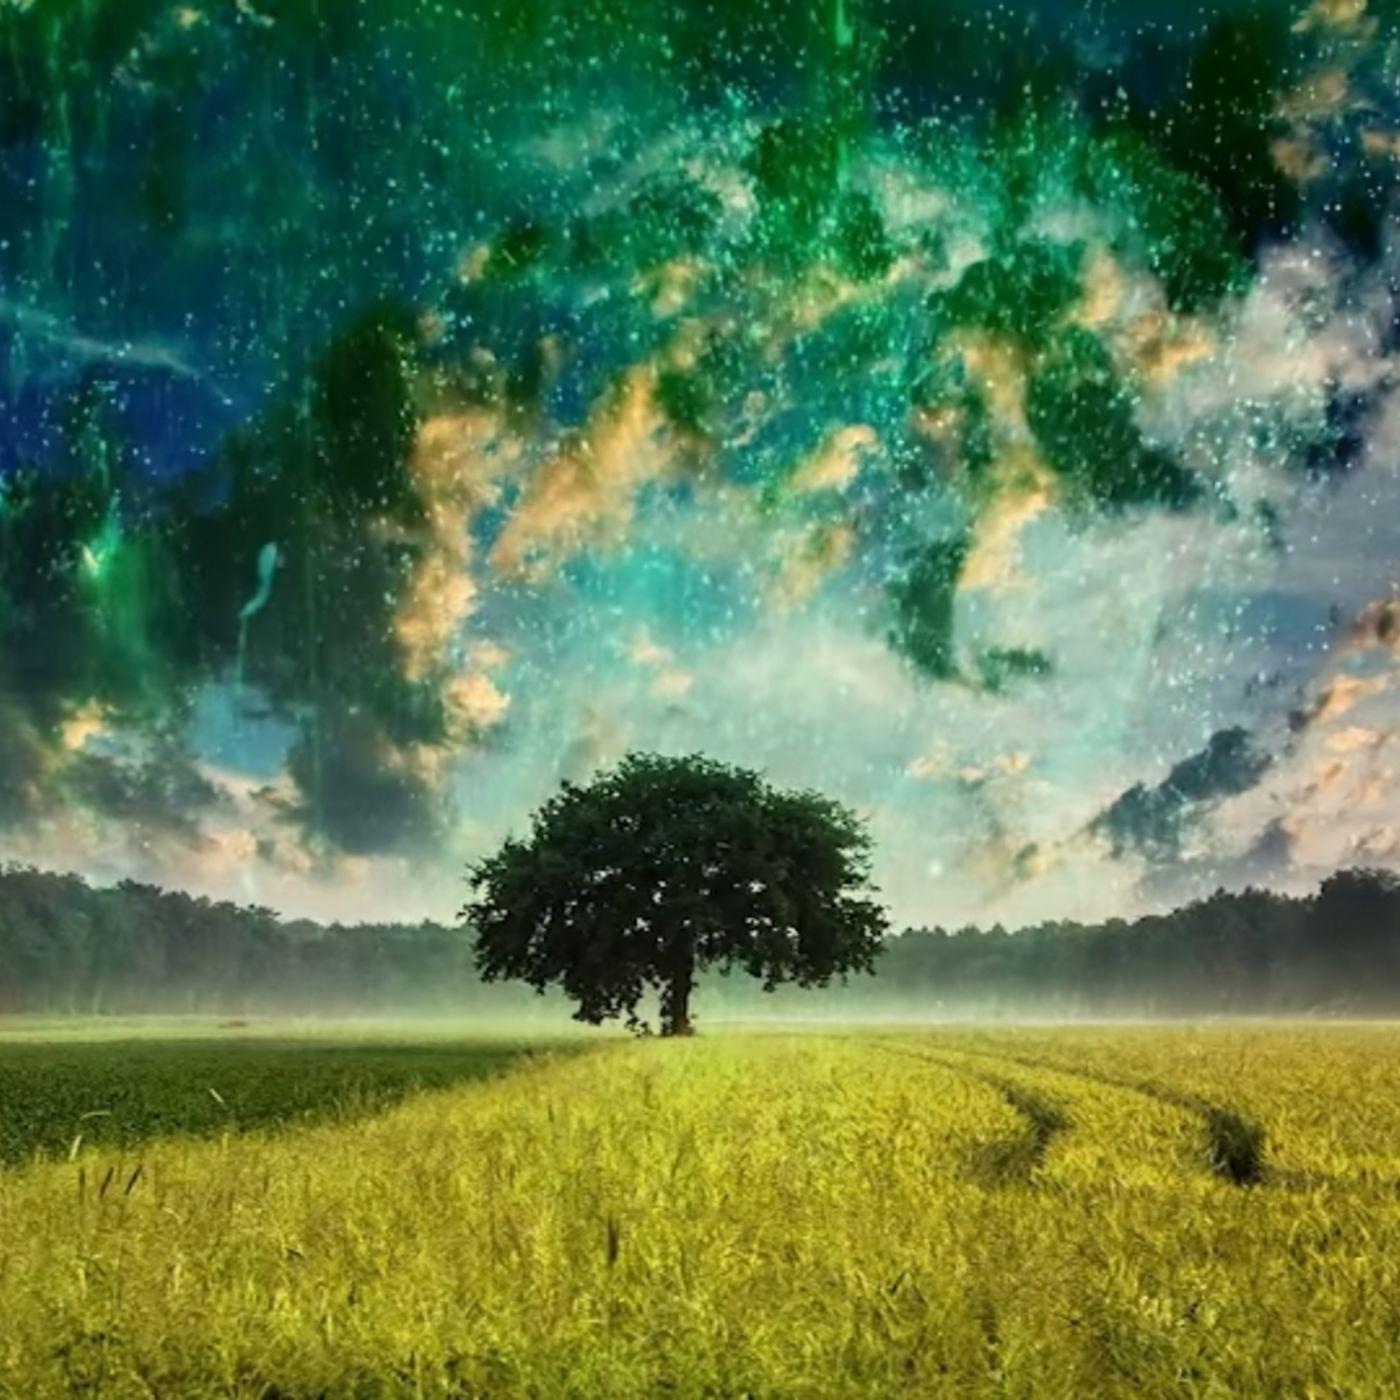 Earth Energy Illumination News for January 17th - 26th